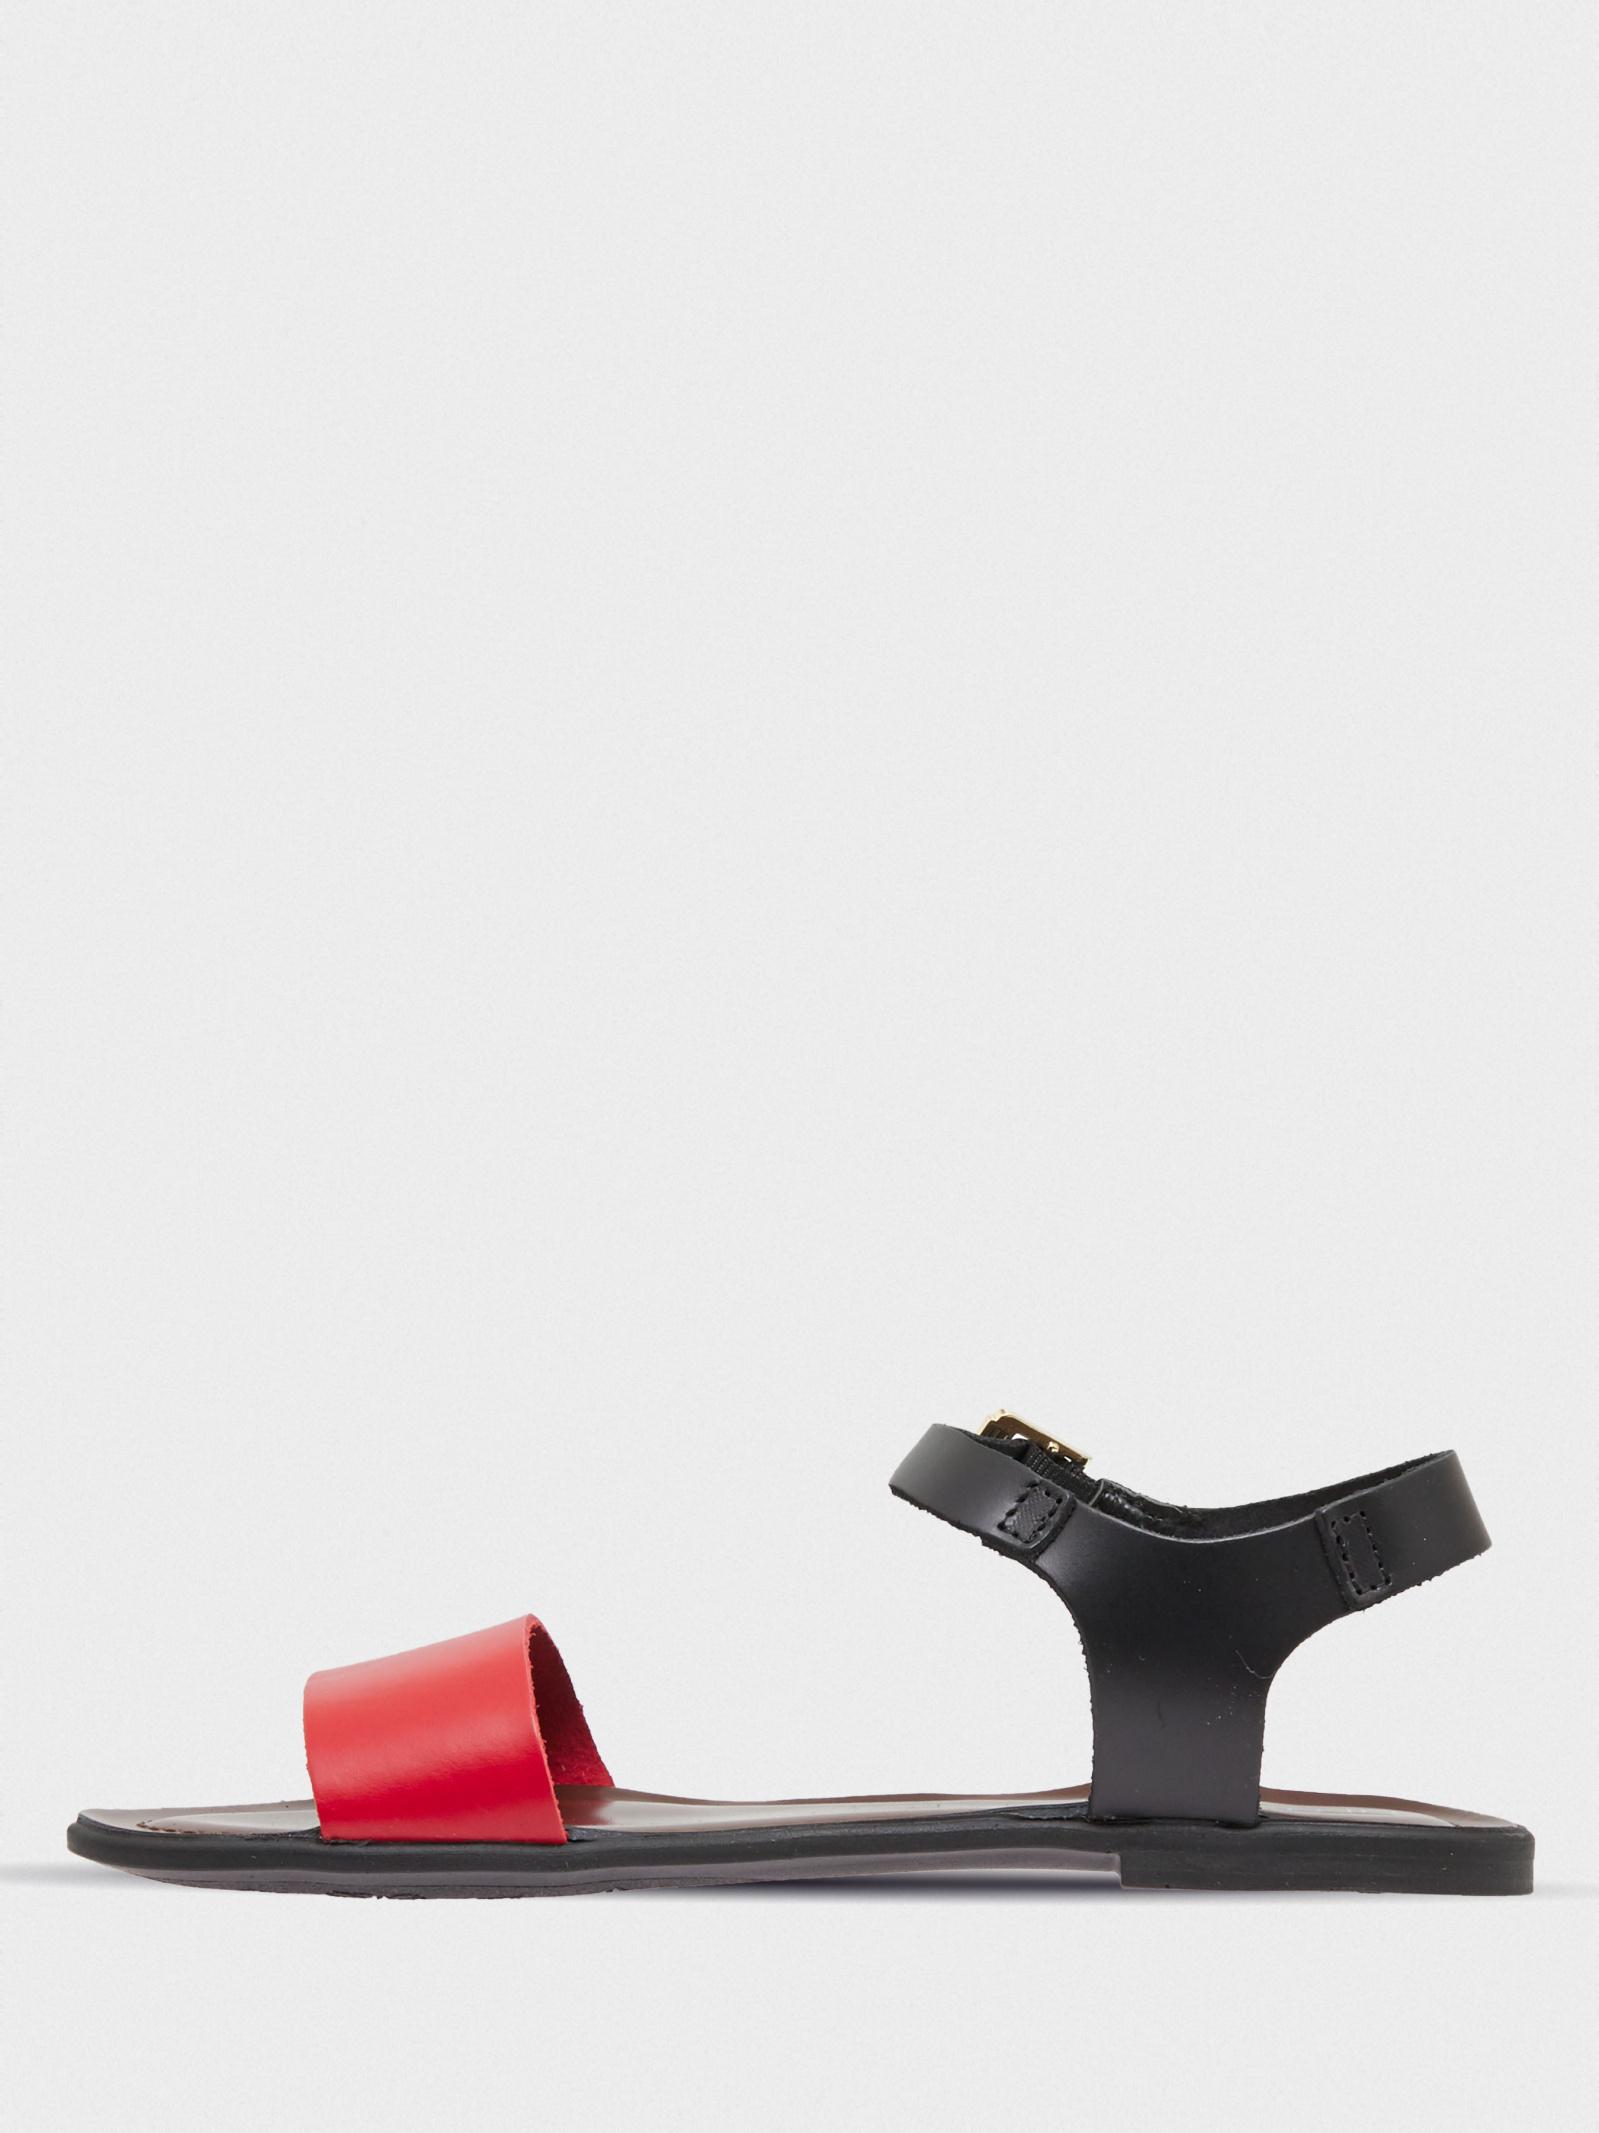 Сандалі  для жінок Braska Inblu VH-2U-02 брендове взуття, 2017